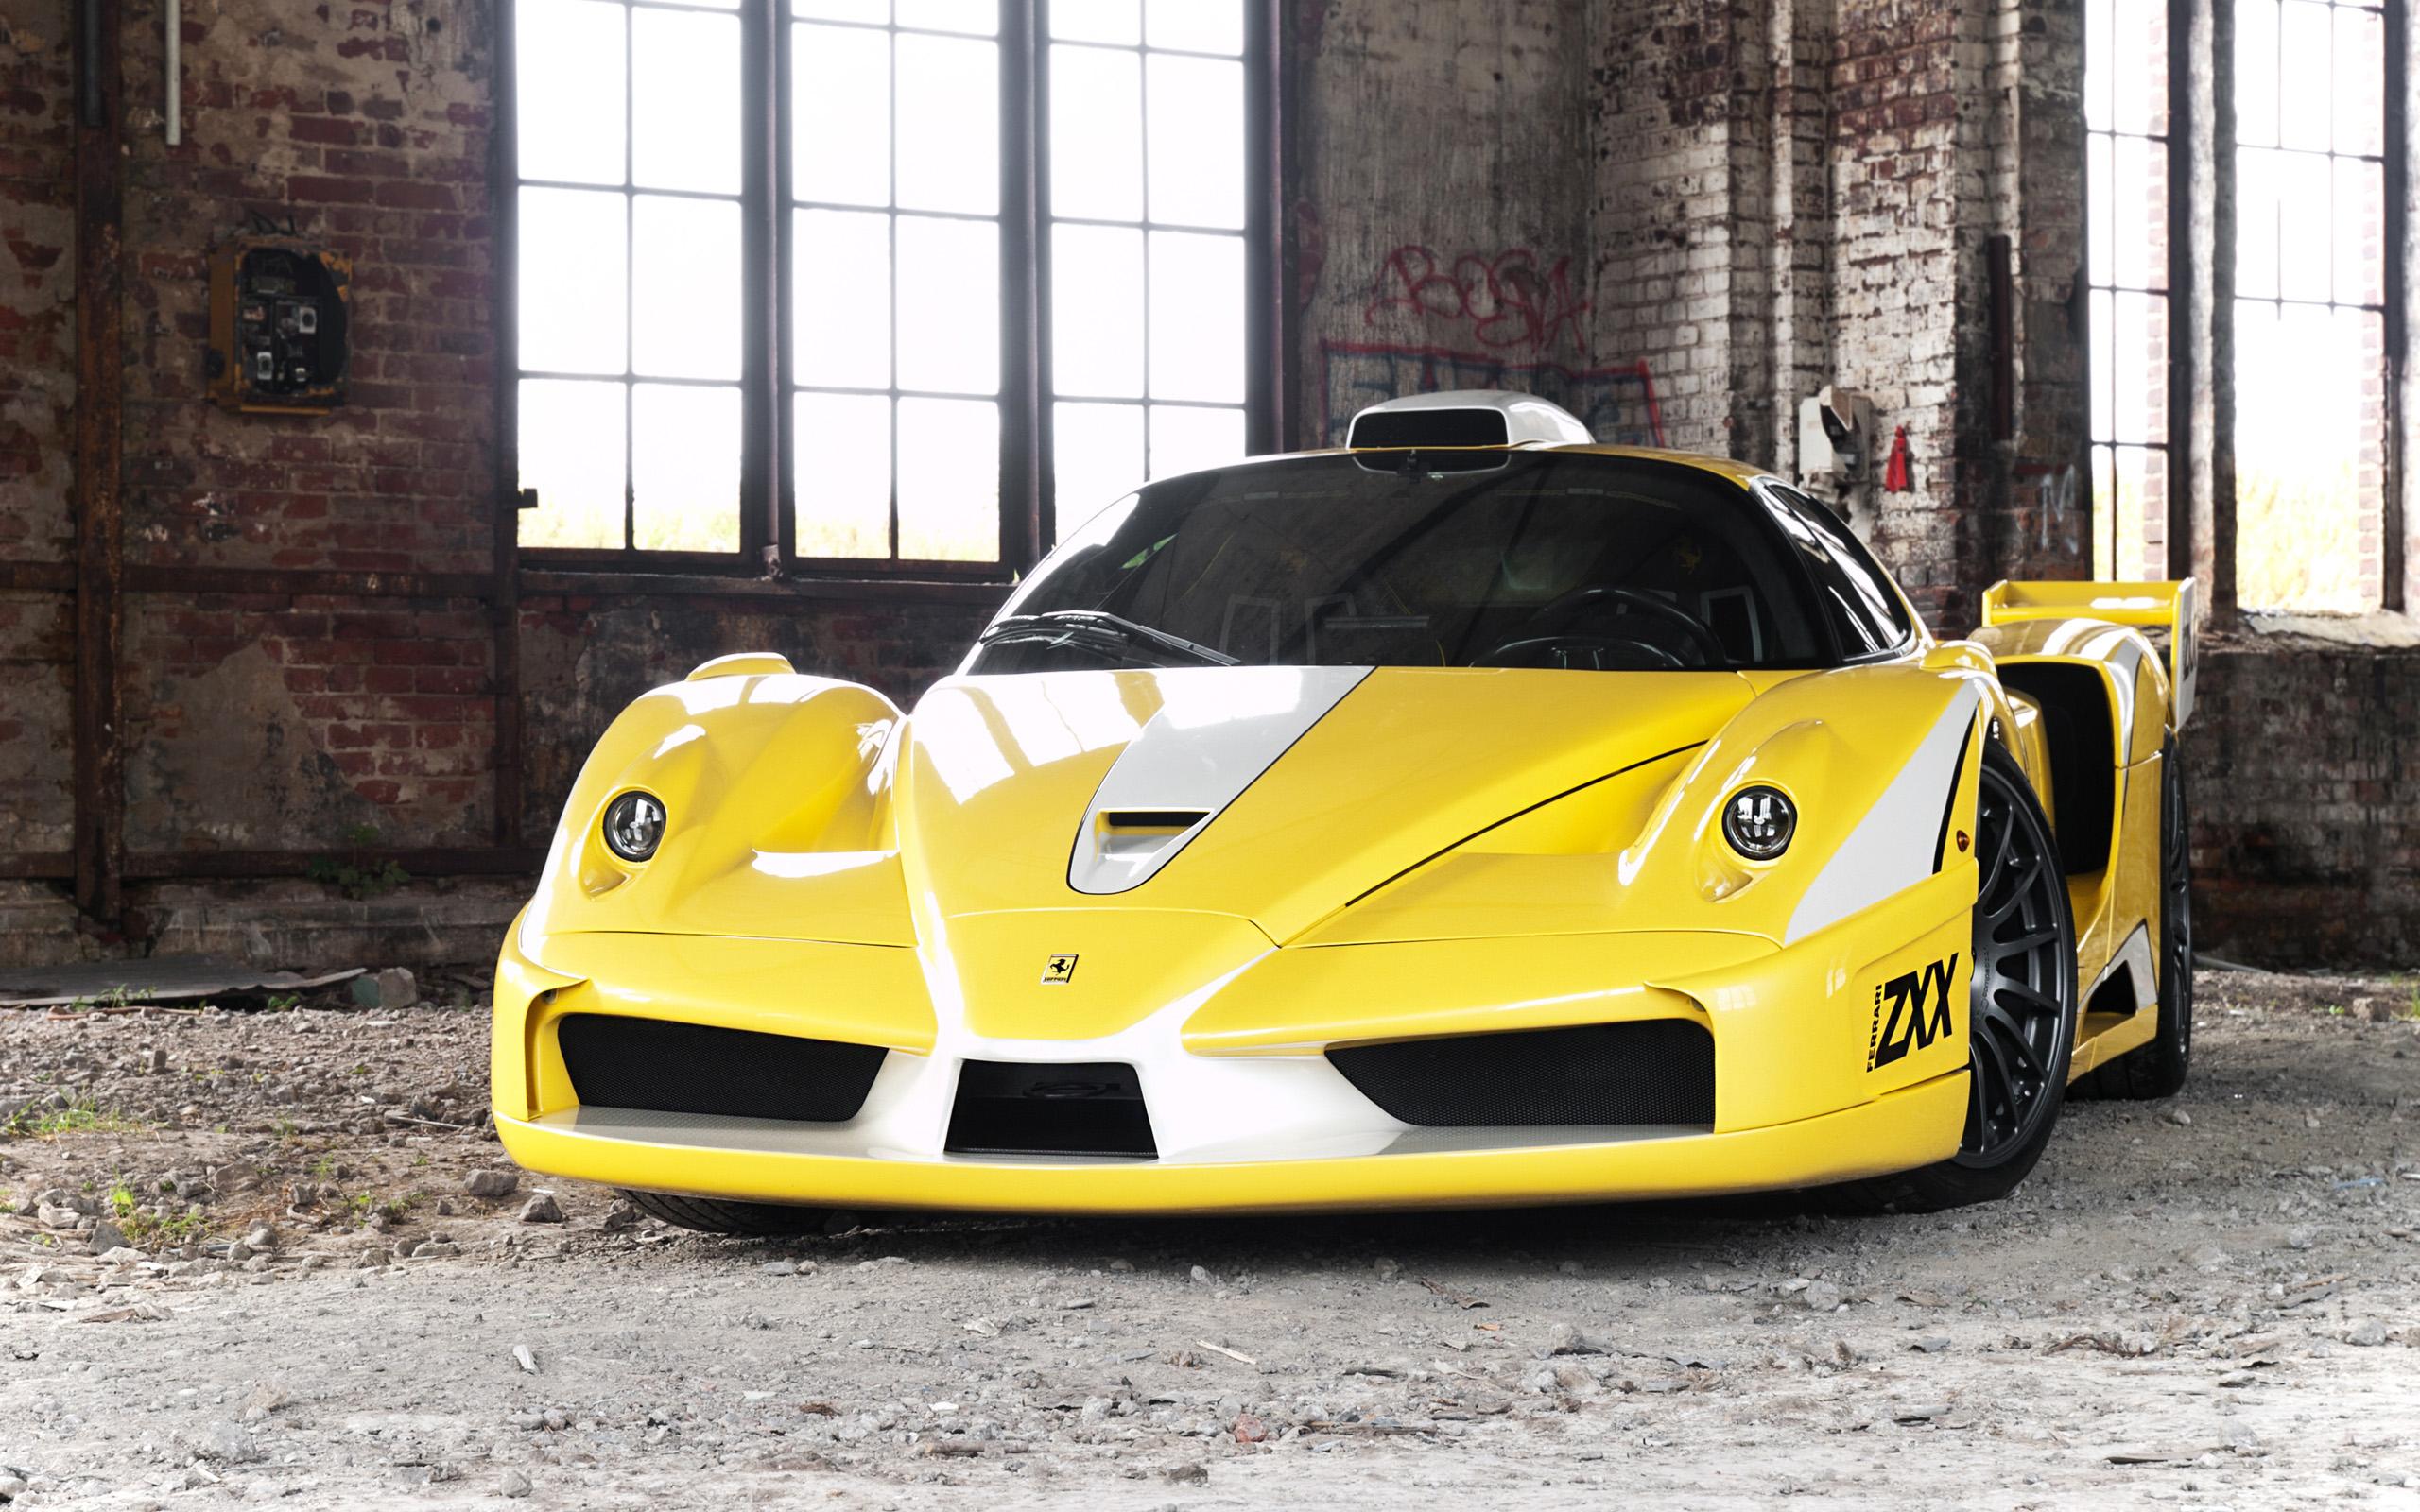 2012 Edo Competition Ferrari Enzo Zxx Supercar Supercars Tuning H Wallpaper 2560x1600 129078 Wallpaperup